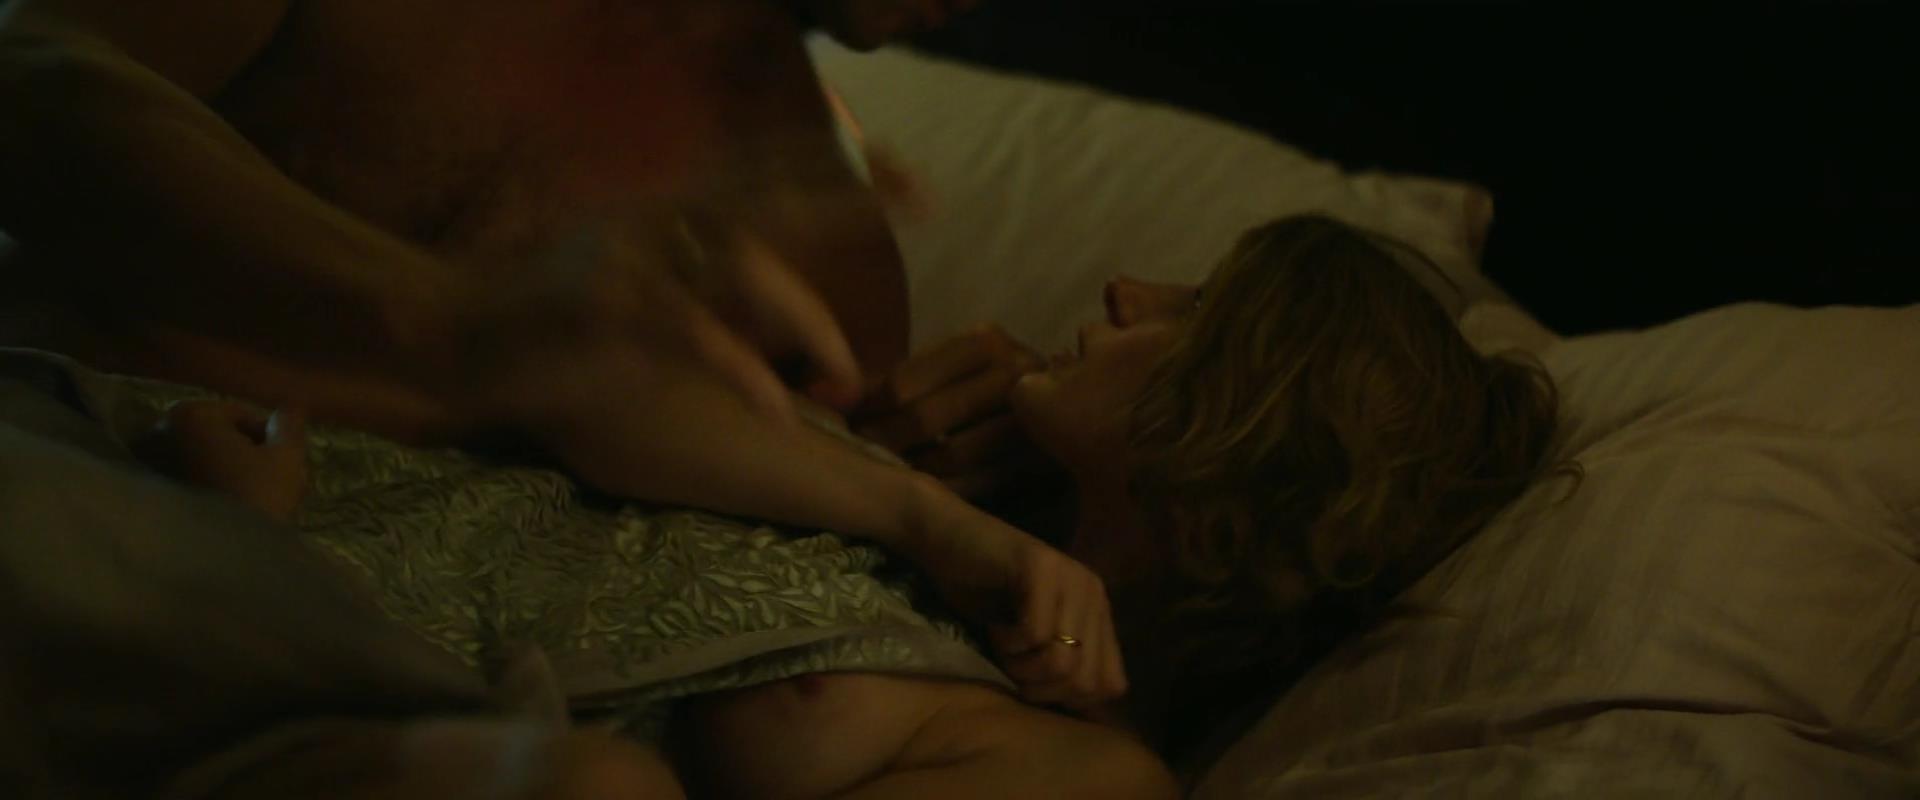 Jessica Chastain vídeo porno 1